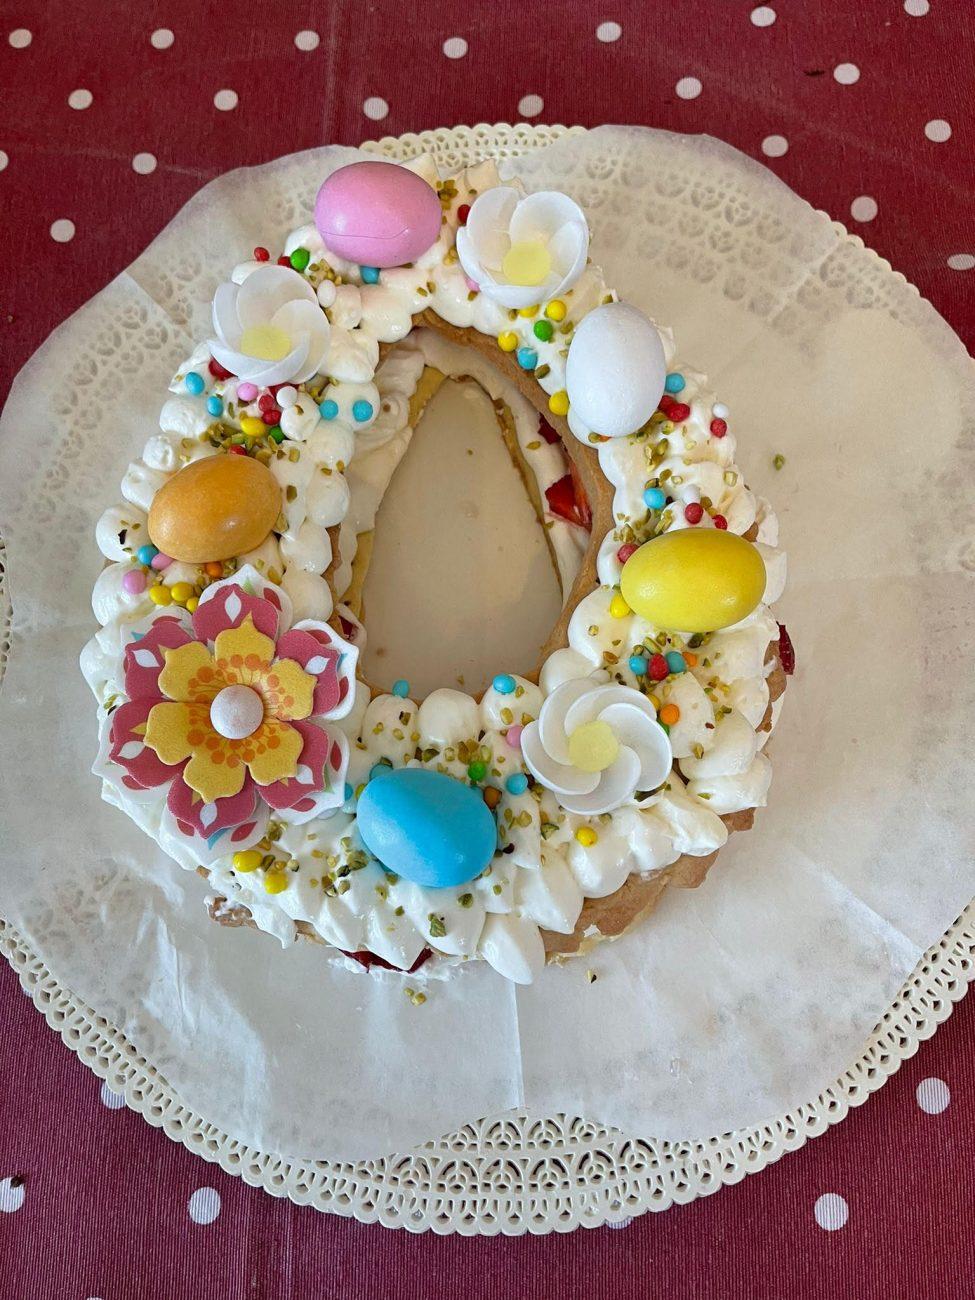 Cream Tart a Forma di Uovo